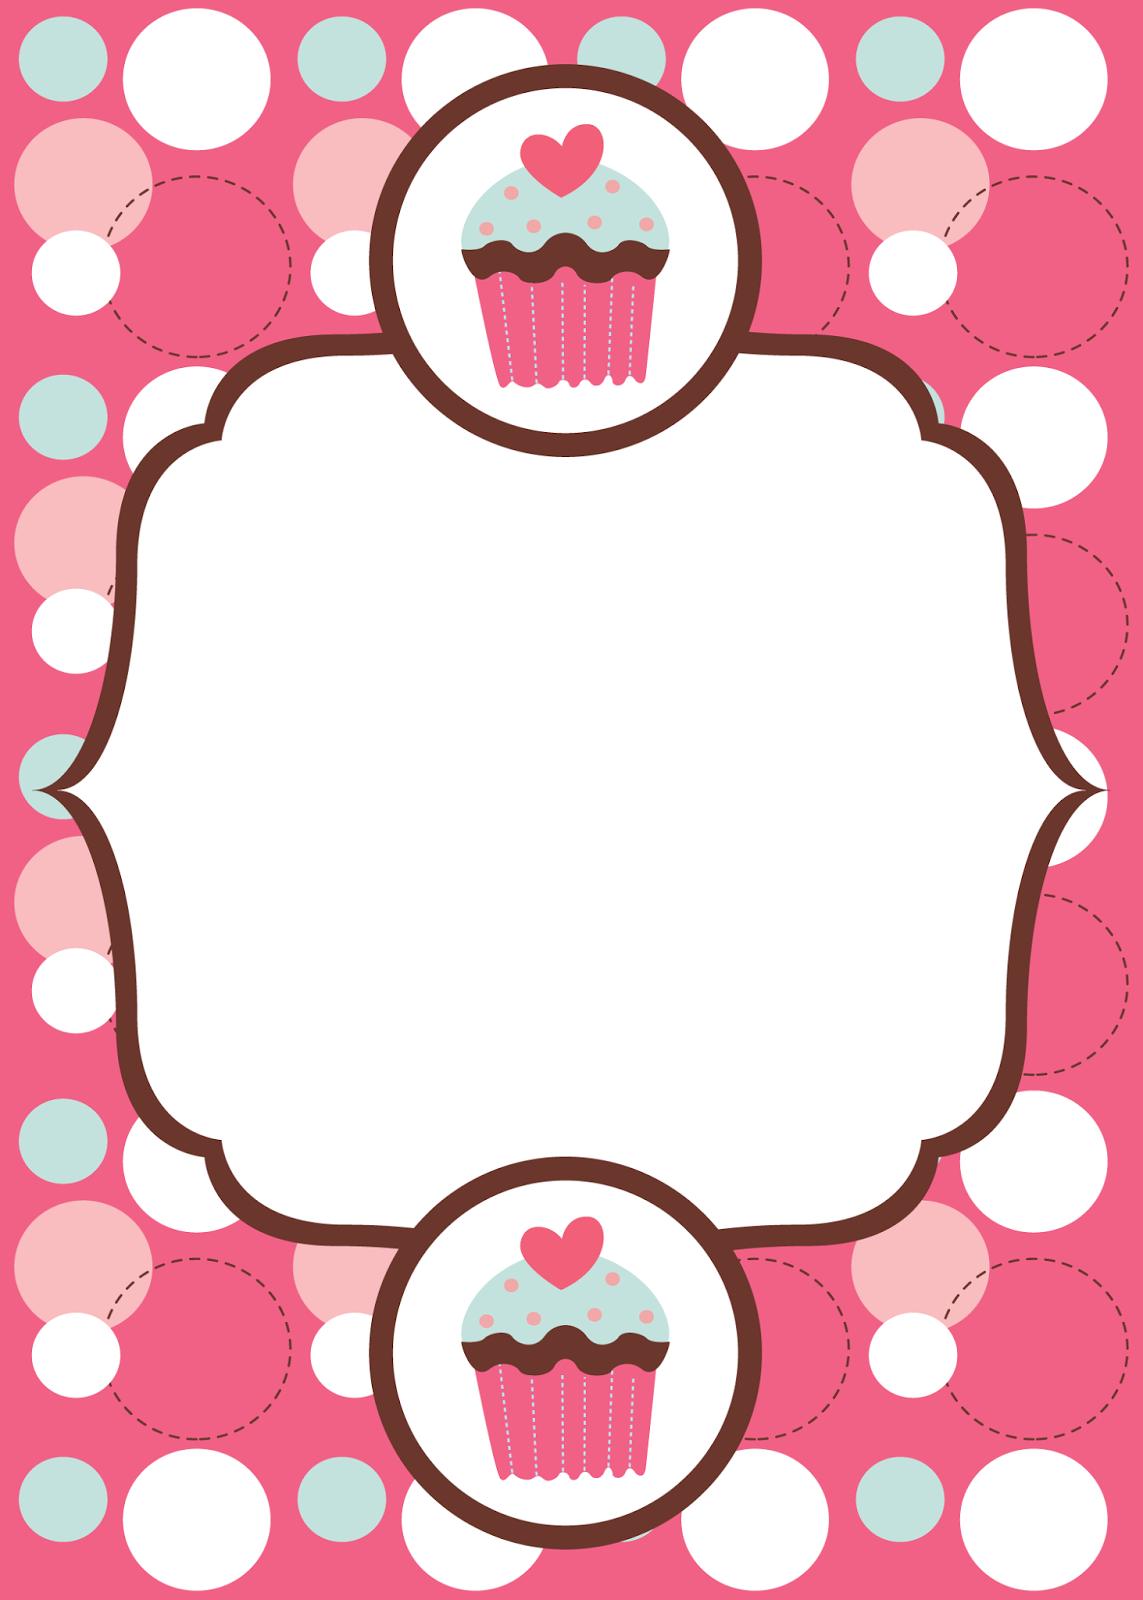 Help Festas e Personalizados: Convites prontos - Cupcake